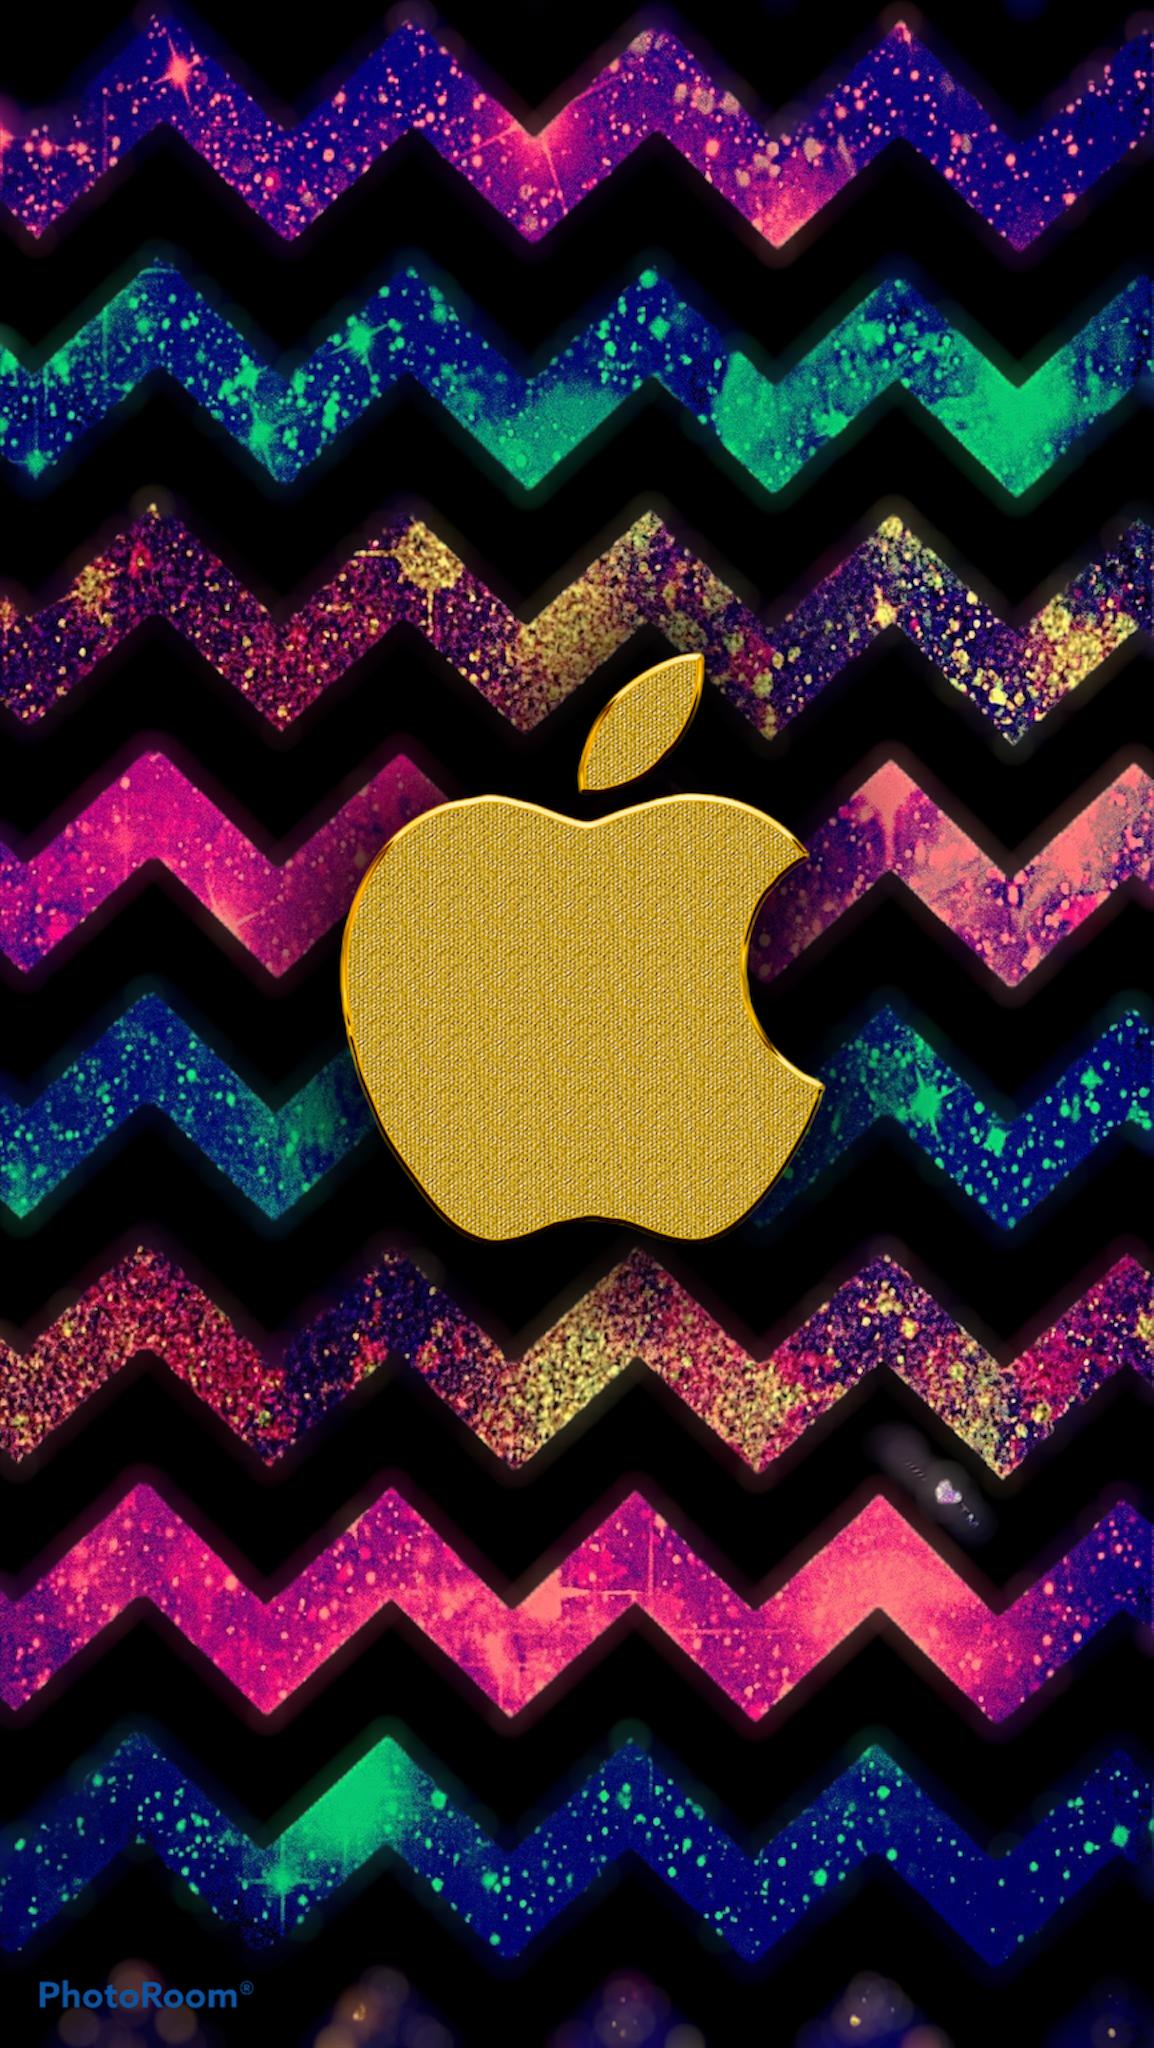 Melly Apple Wallpaper Iphone Apple Logo Wallpaper Apple Iphone Wallpaper Hd